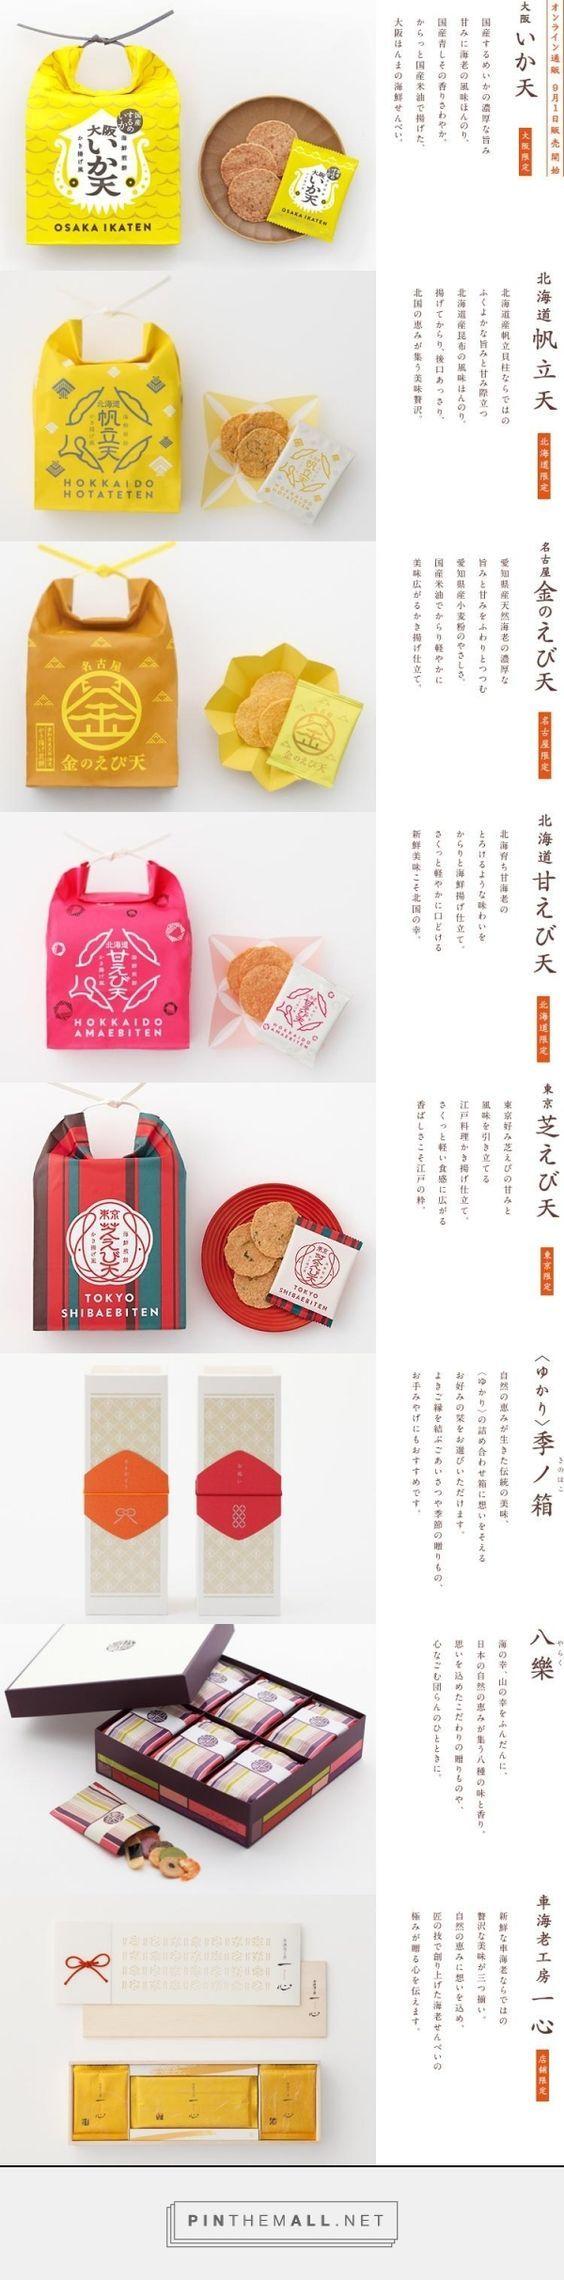 http://www.bankaku.co.jp/online/osaka_ikaten.php